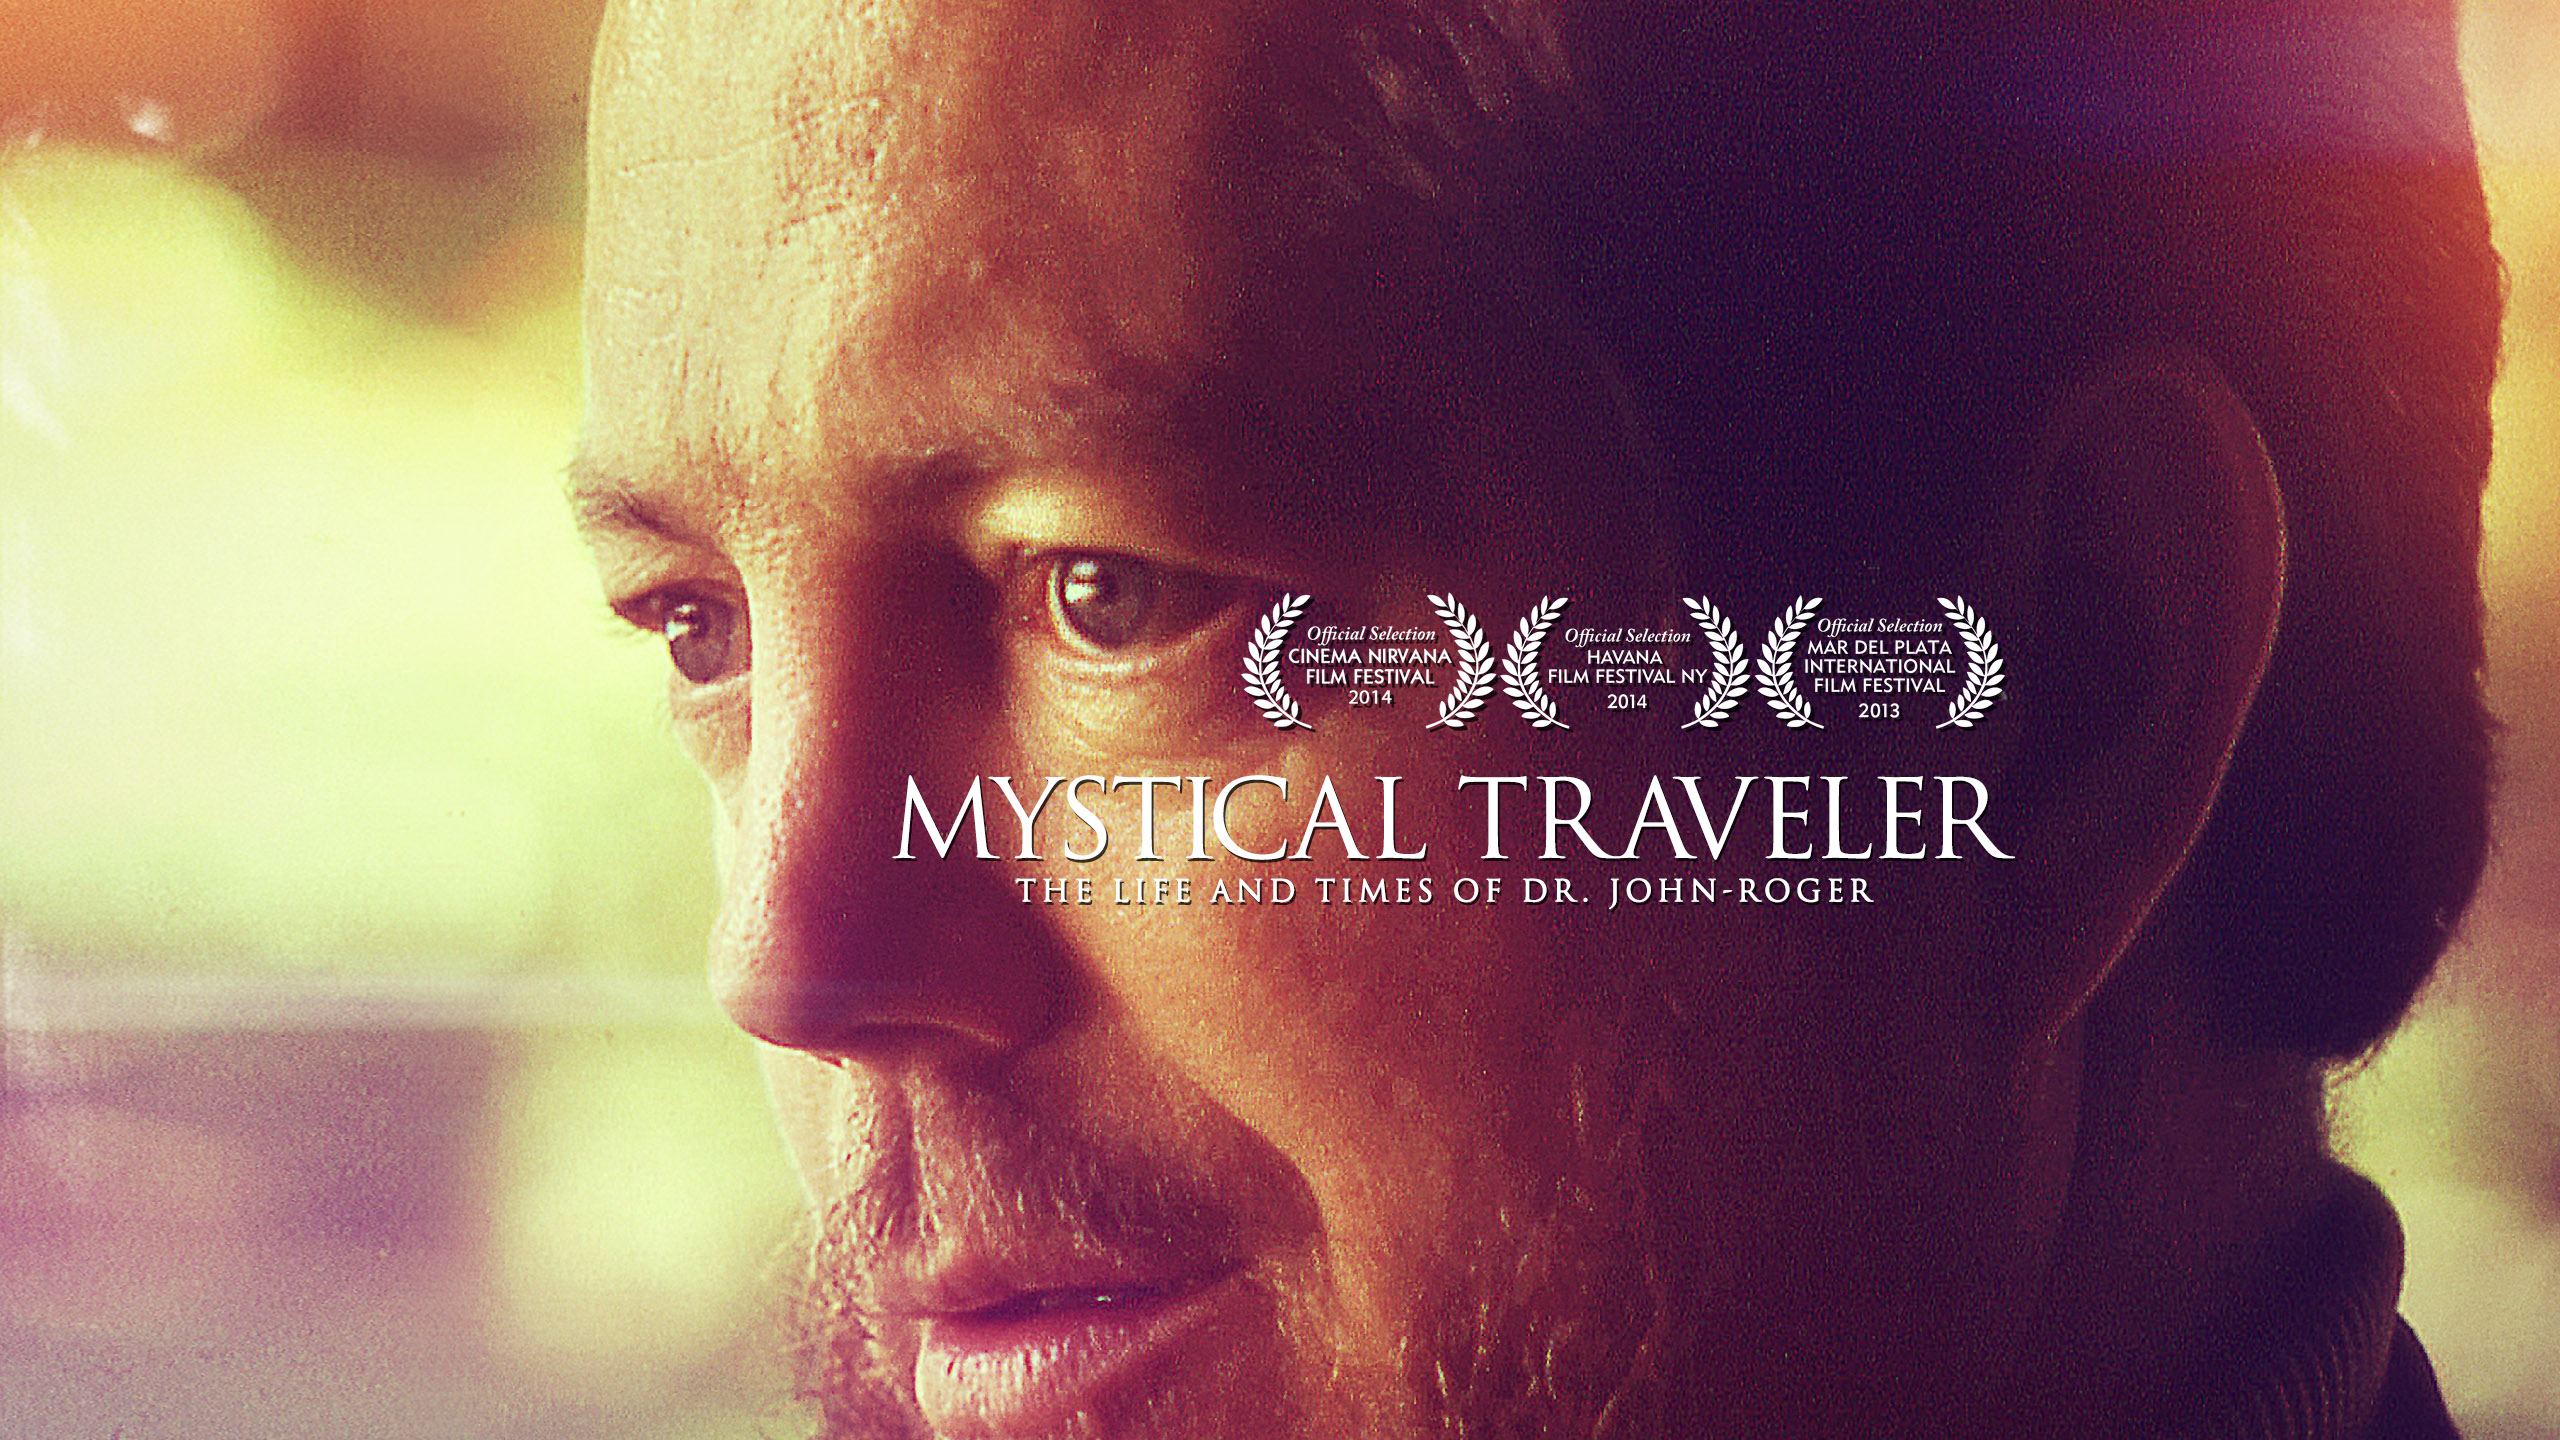 Integrity Day Tour 9/24/ Screening Mystical Traveler Film and 9/26 John-Roger Marathon John-Roger turns 81 — Happy Birthday J-R!